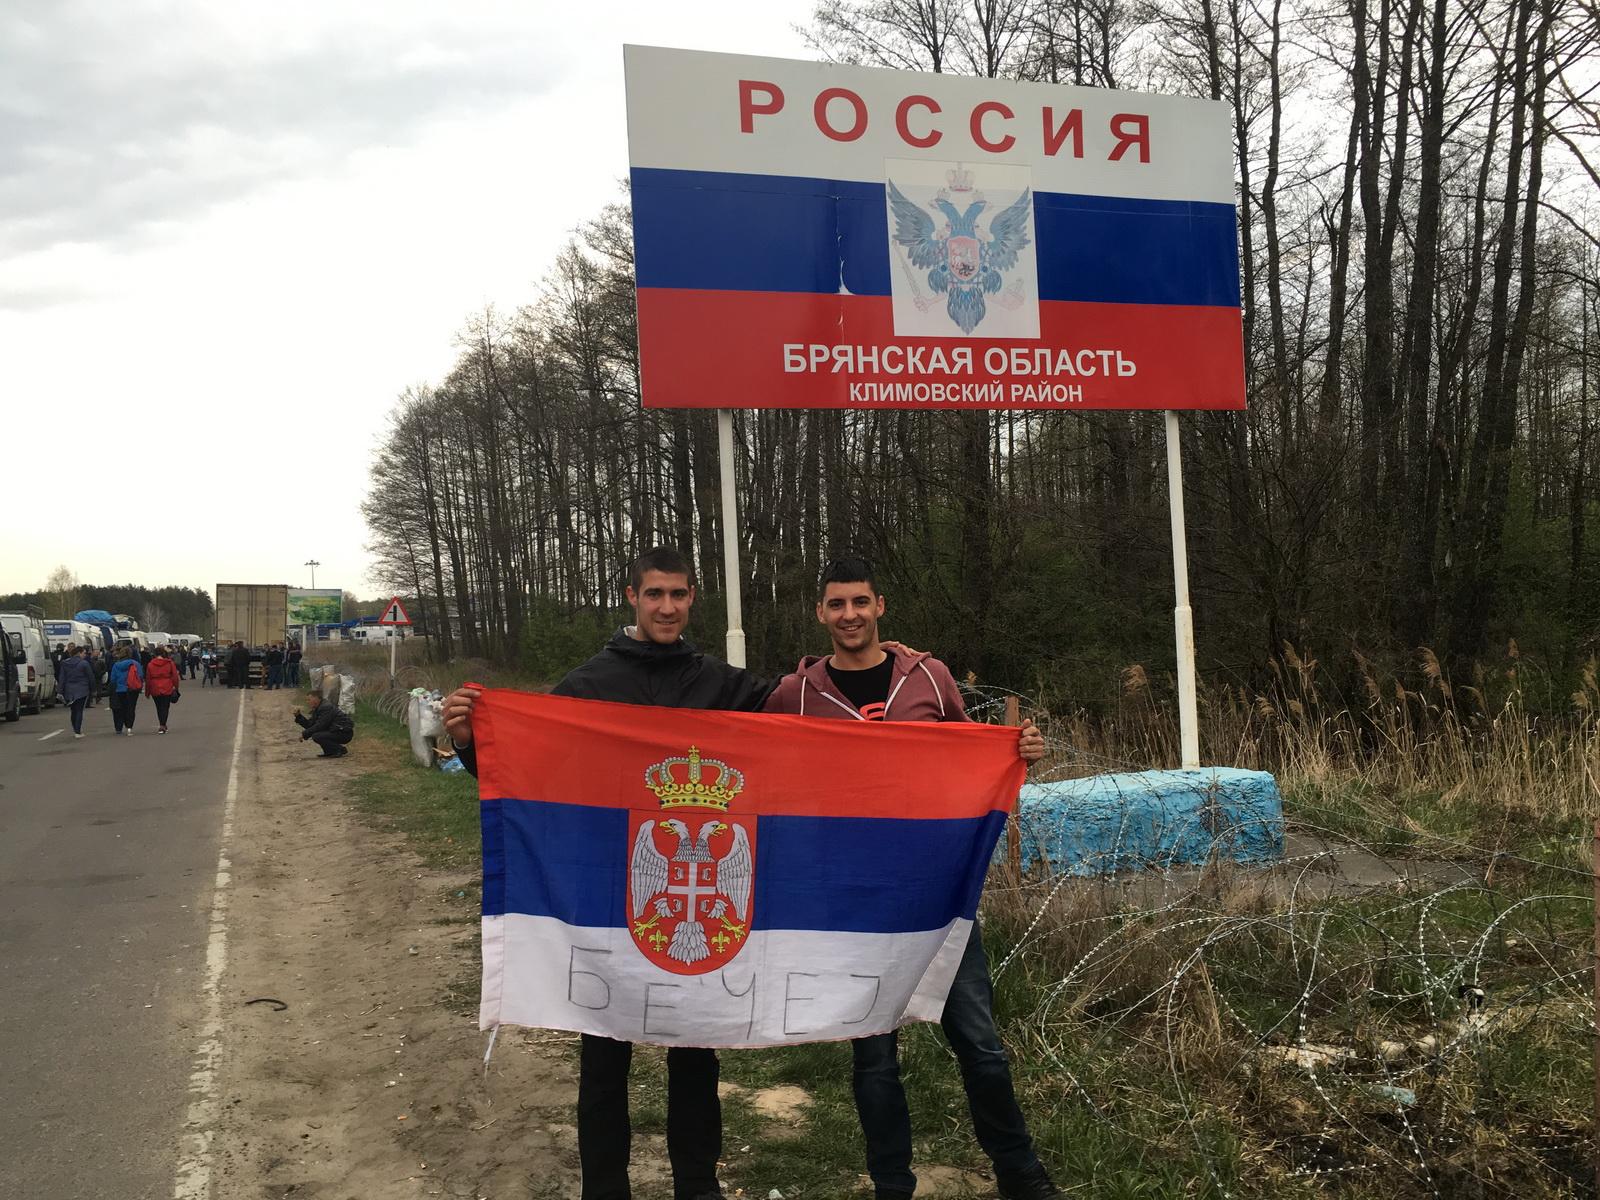 I napokon Rusija